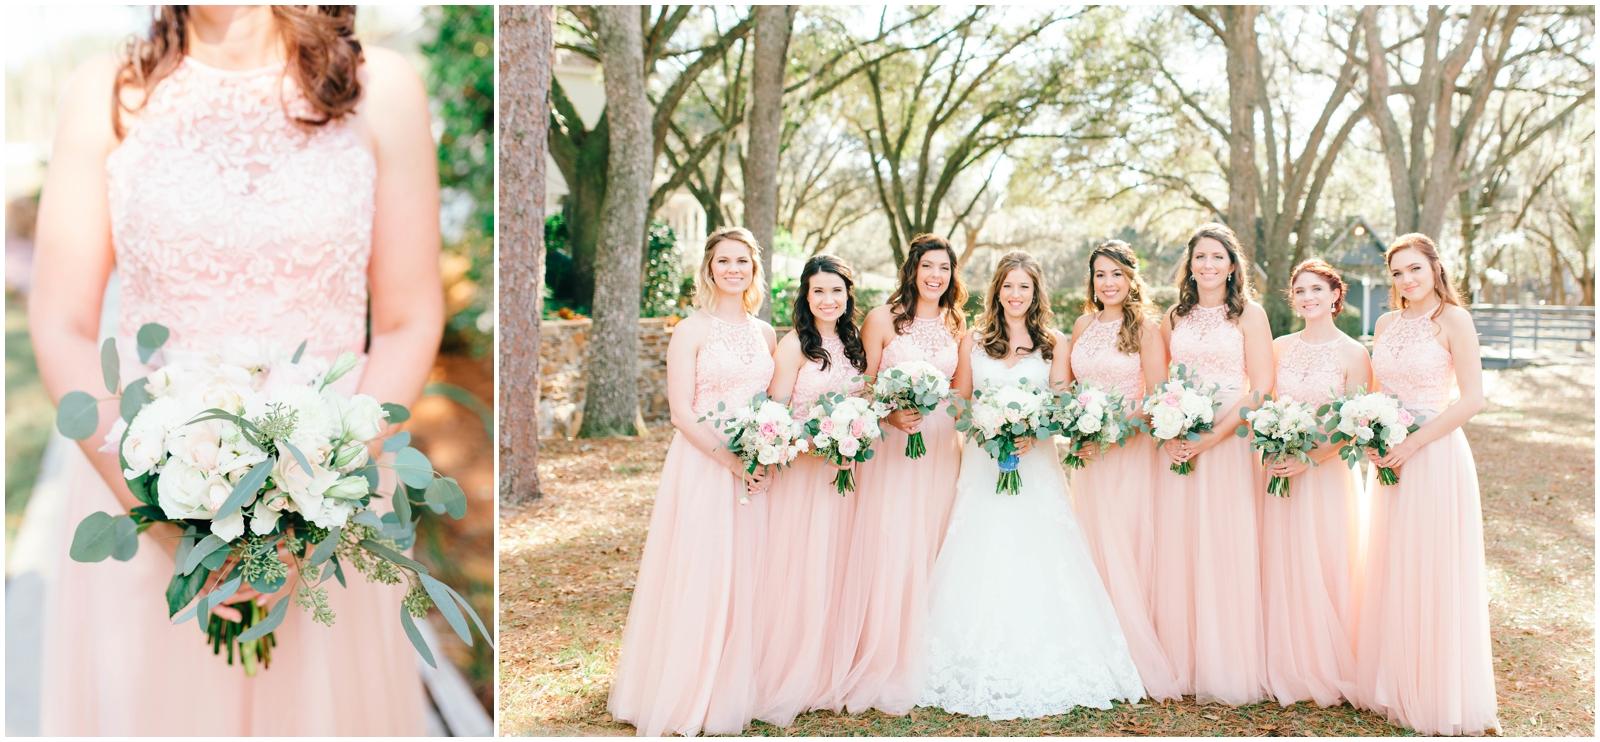 Tampa Area Wedding Venue with Southern Charm- Stonebridge Events_0273.jpg